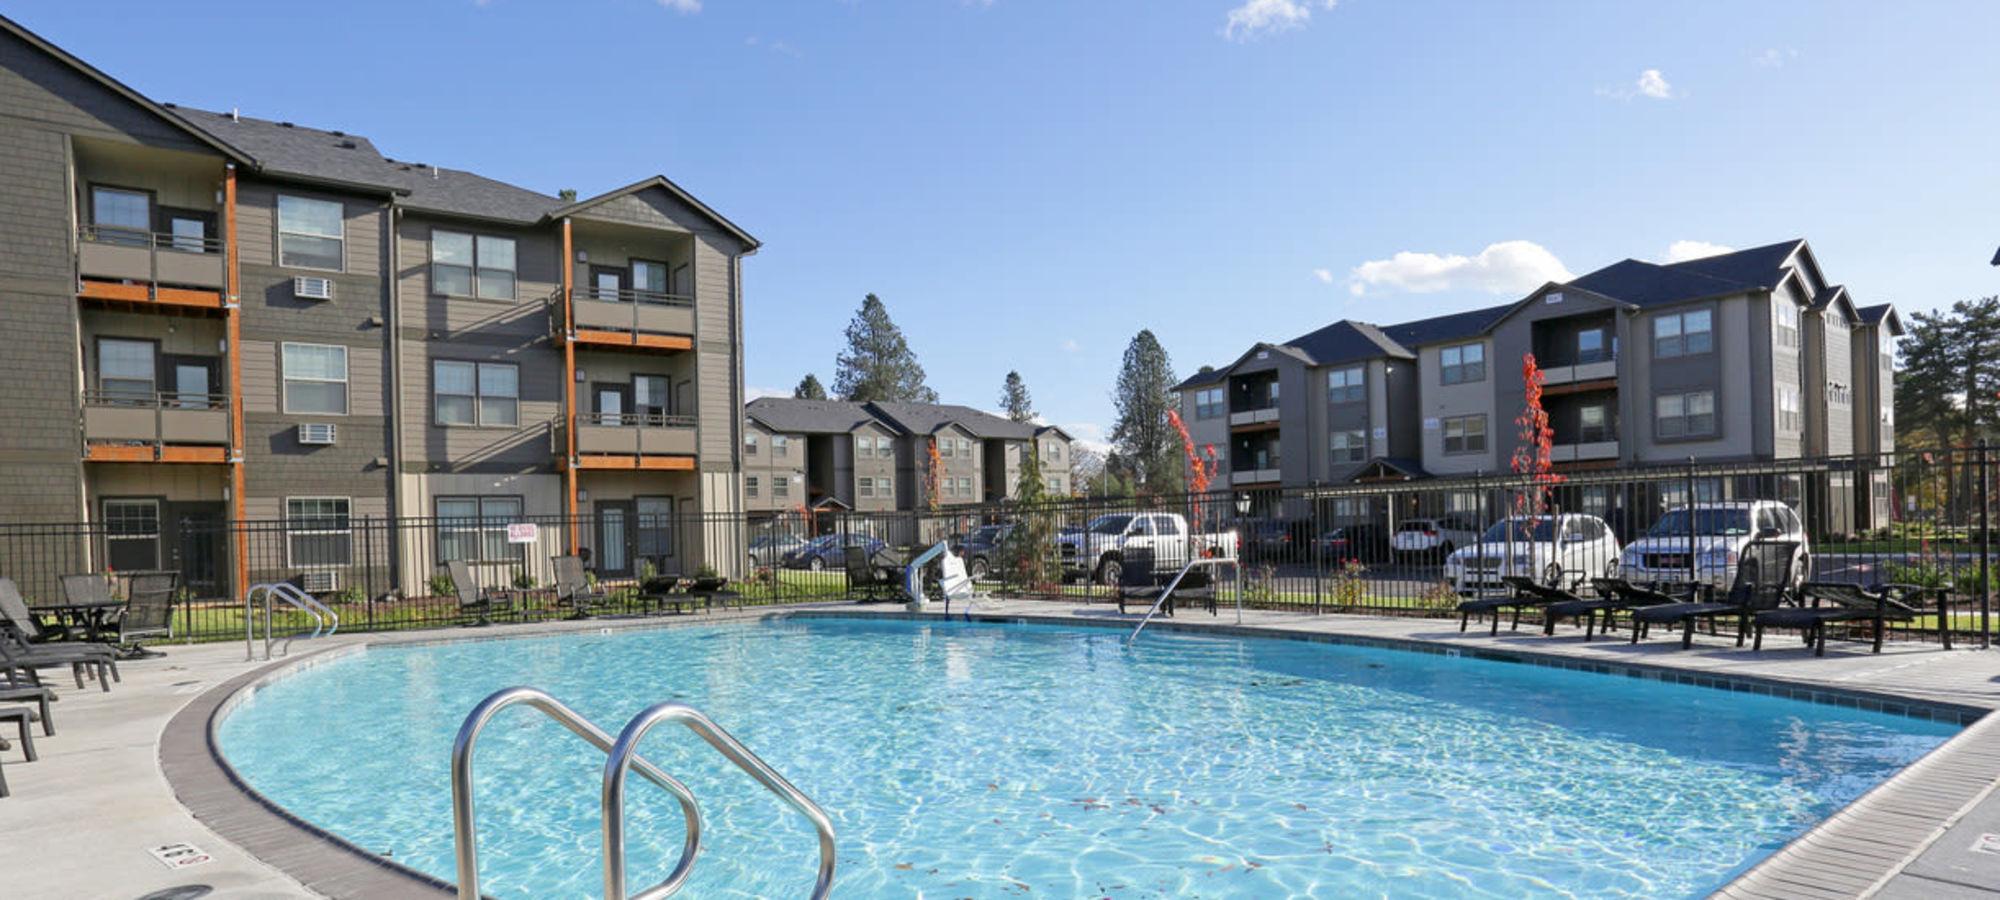 The Fairway Apartments in Salem, Oregon